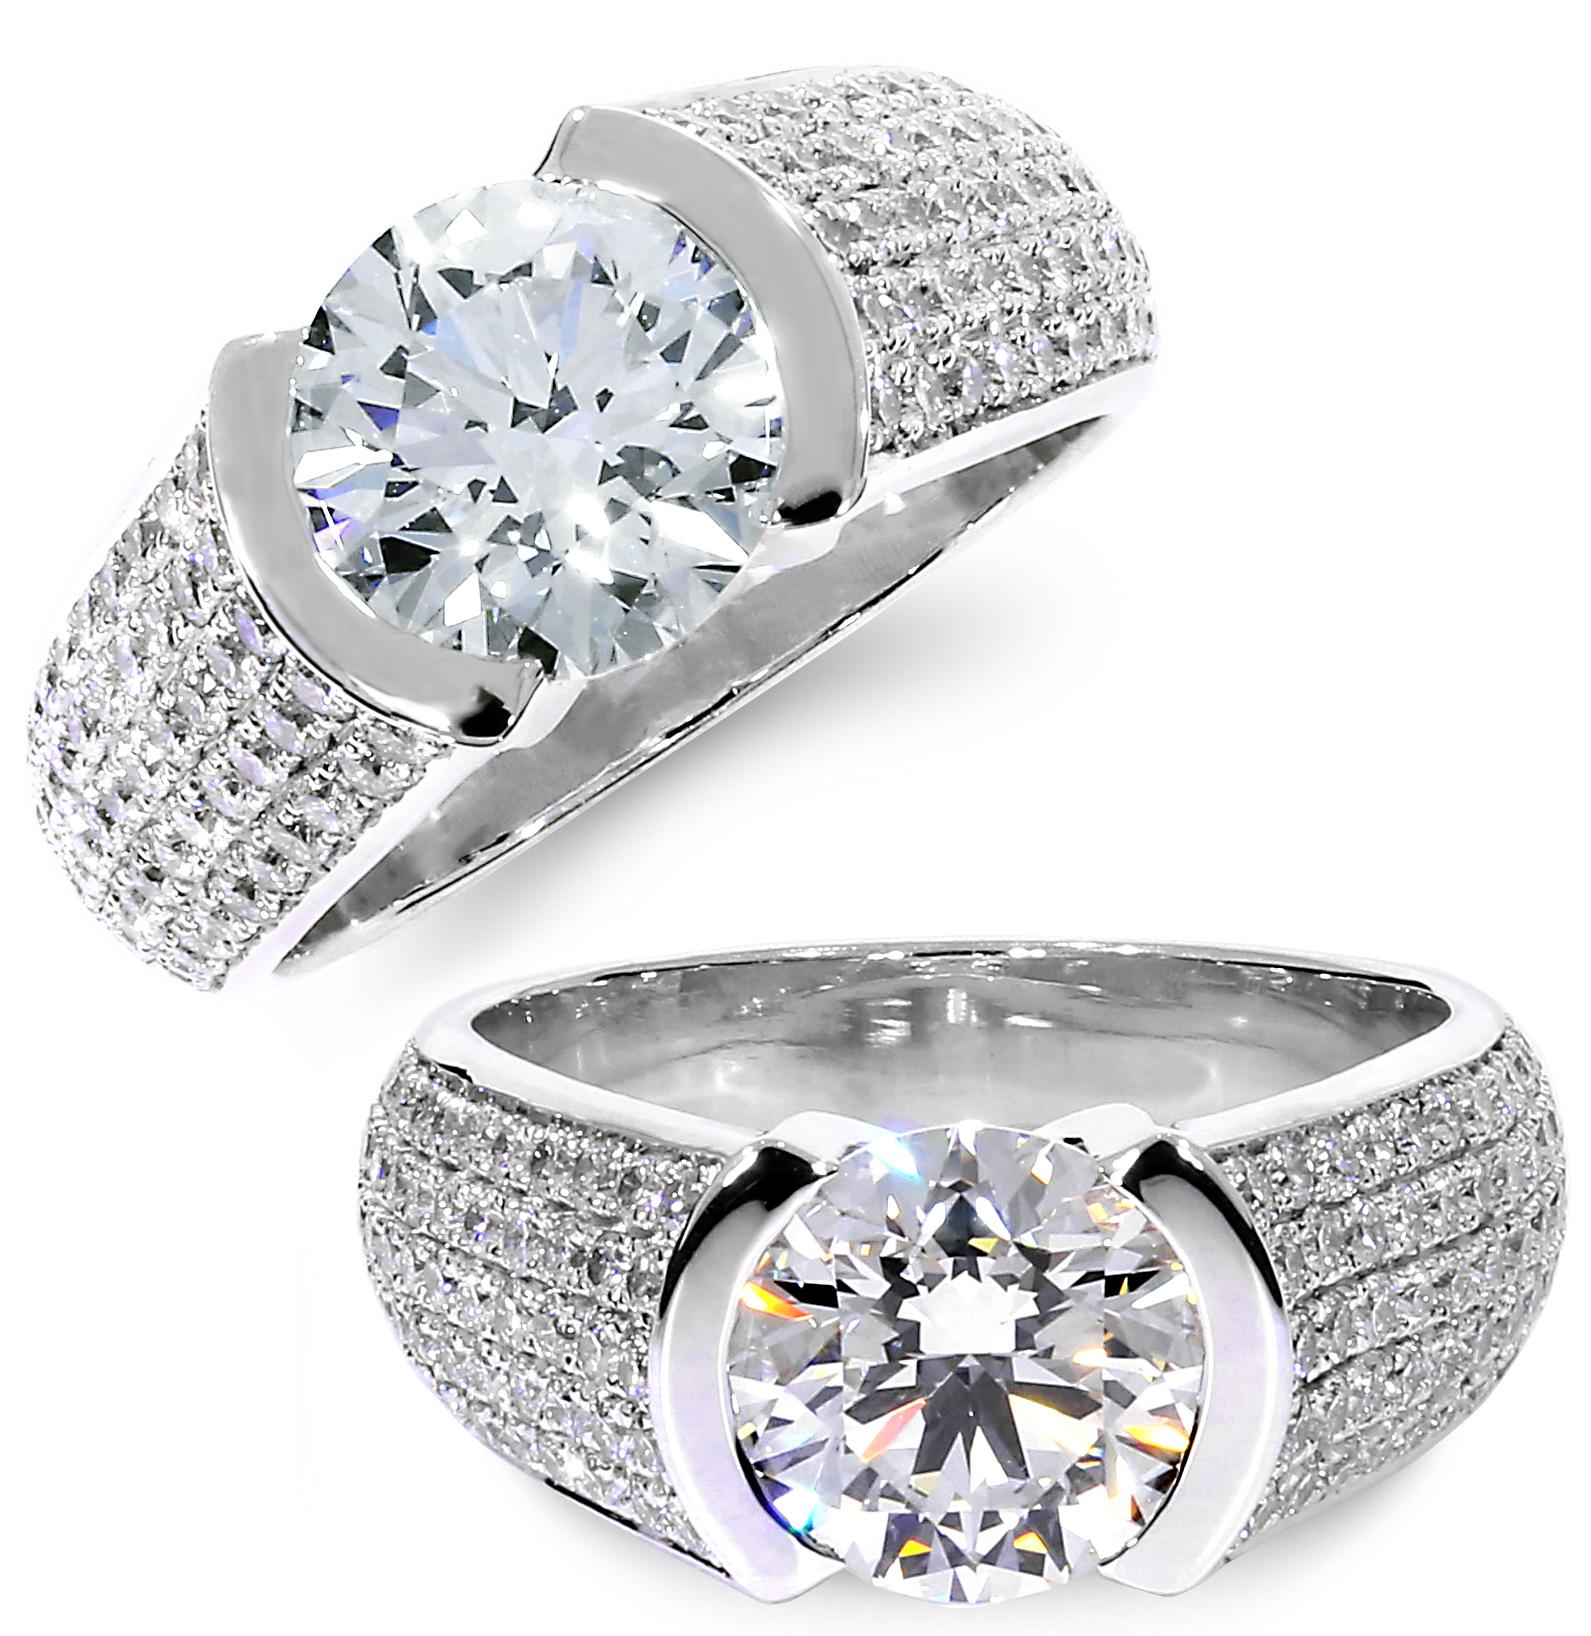 diamond pave engagment ring